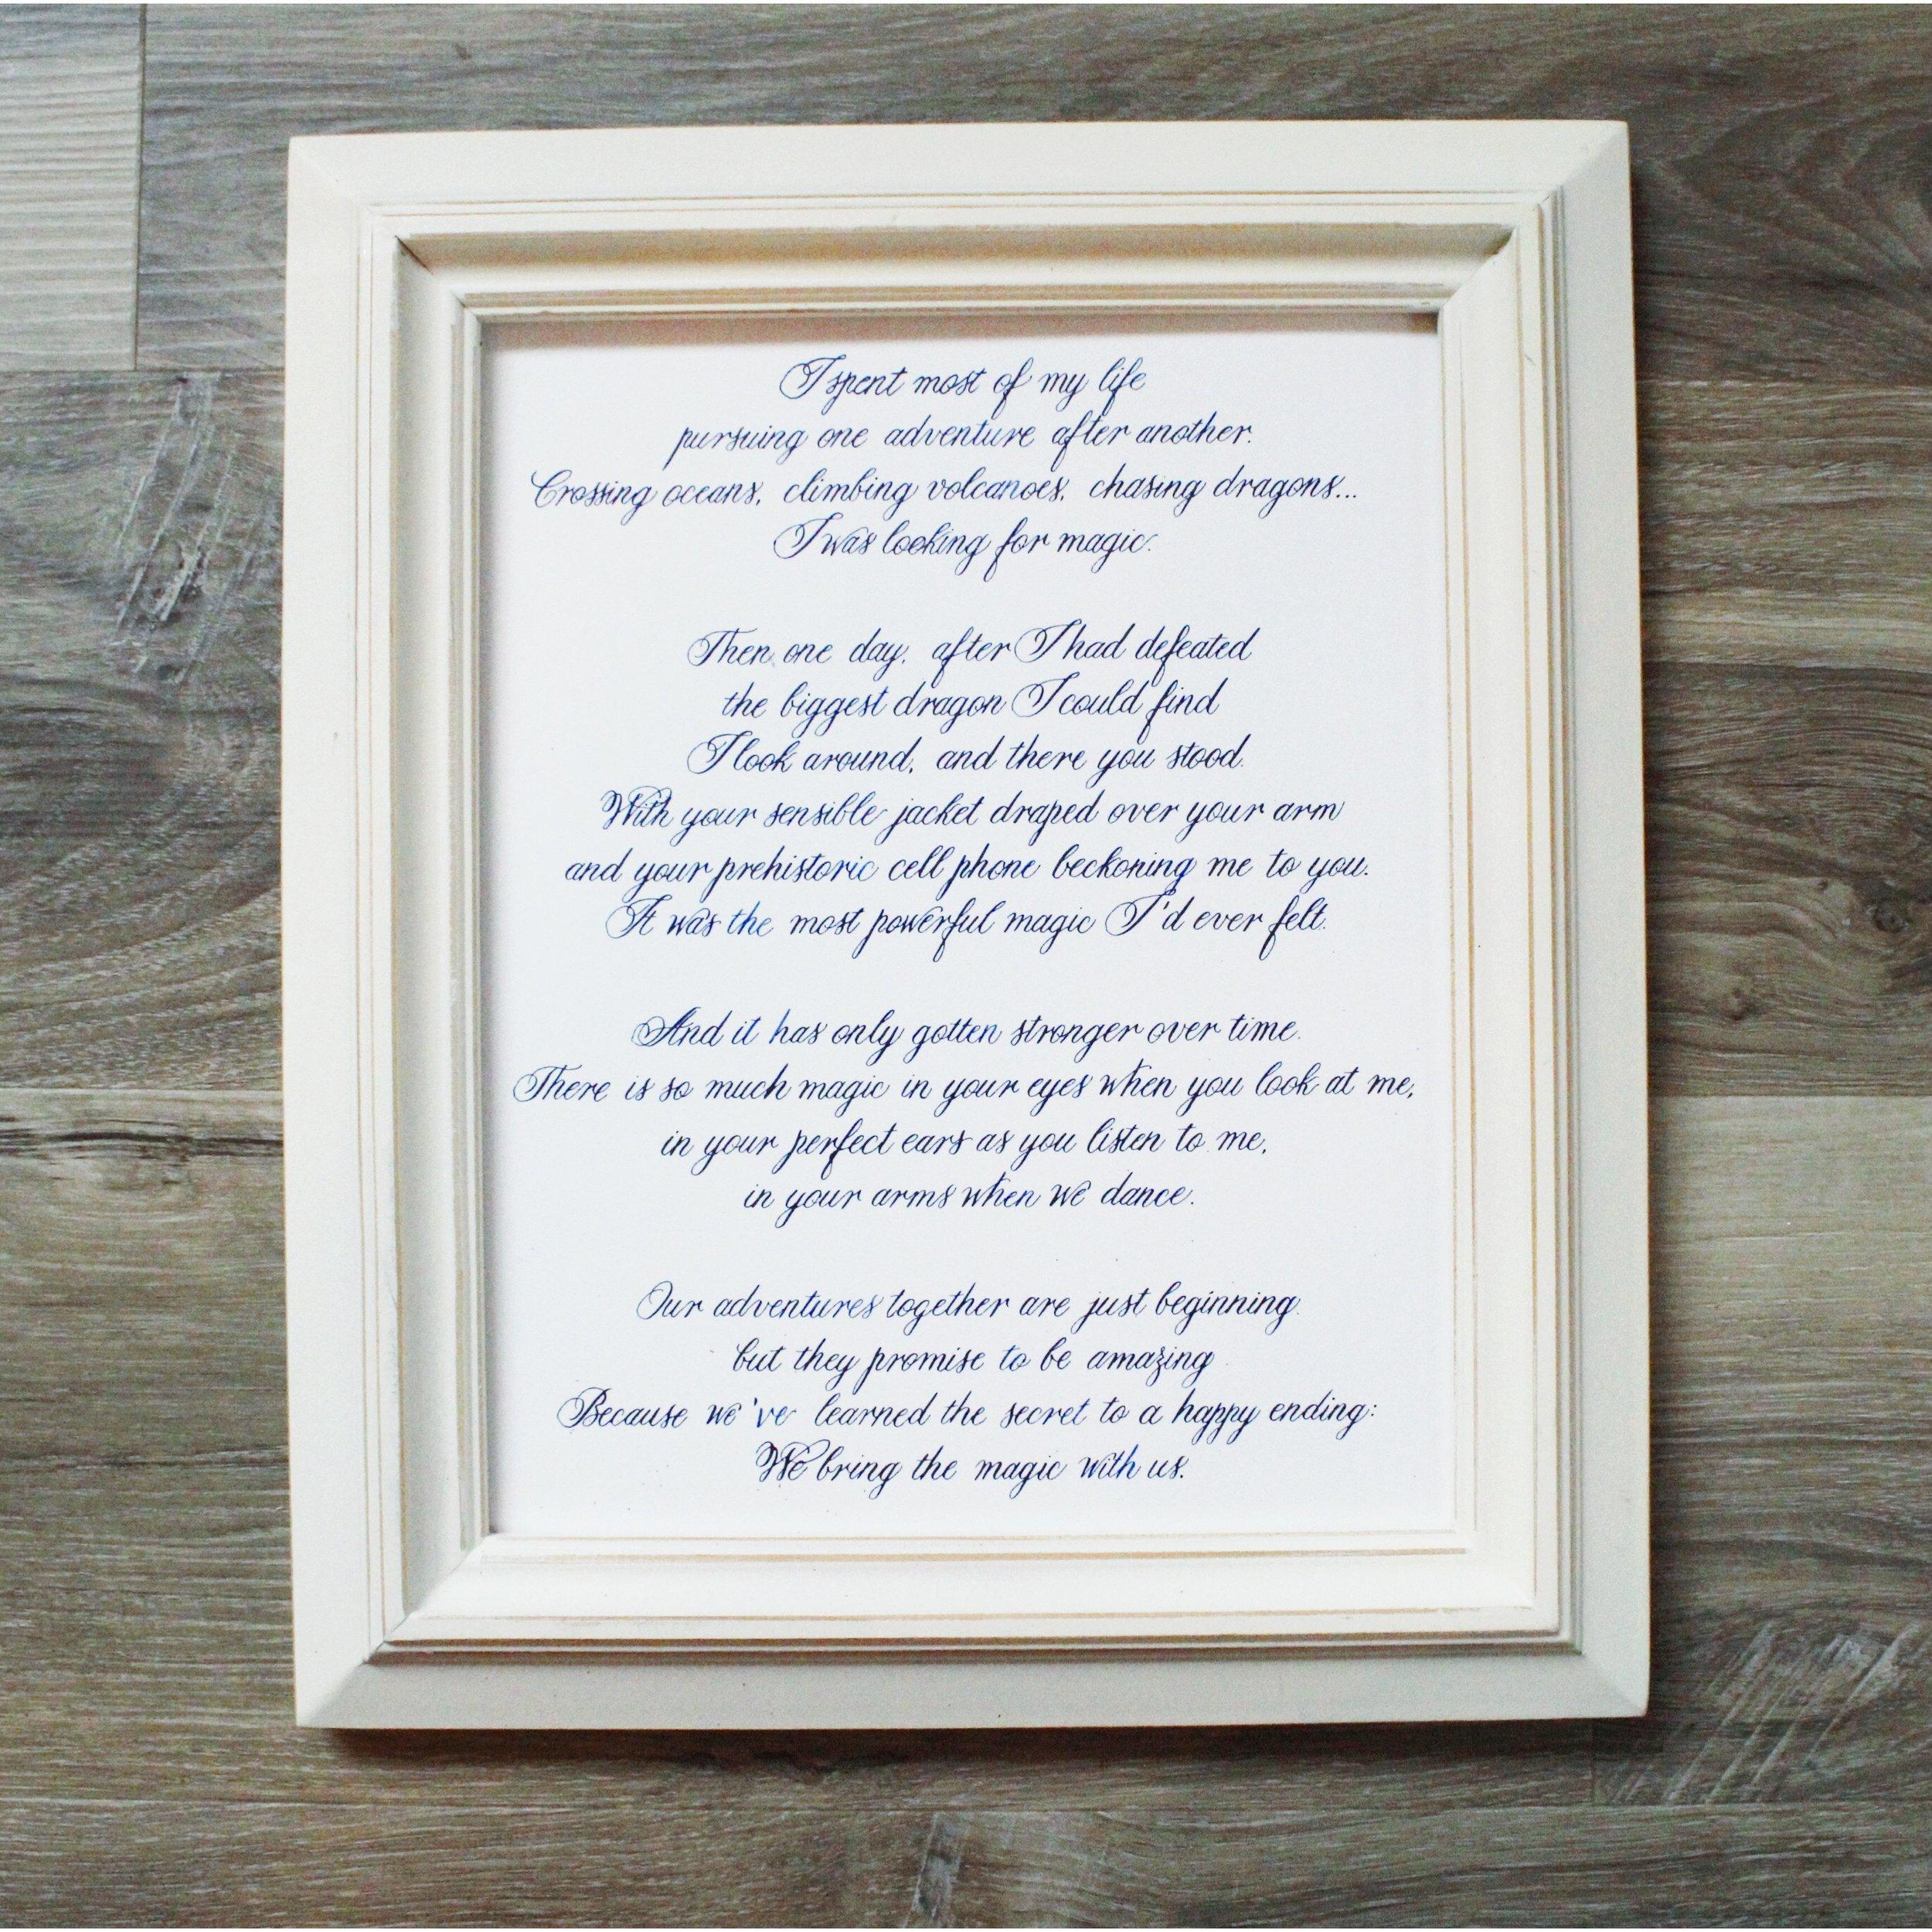 Central PA, York PA, JesSmith Designs, custom, wedding, invitations, bridal, announcements, save the date, baby, hanover, calligraphy, baltimore, wedding invitations, lancaster, gettysburg-05-10 05.05.53.jpg